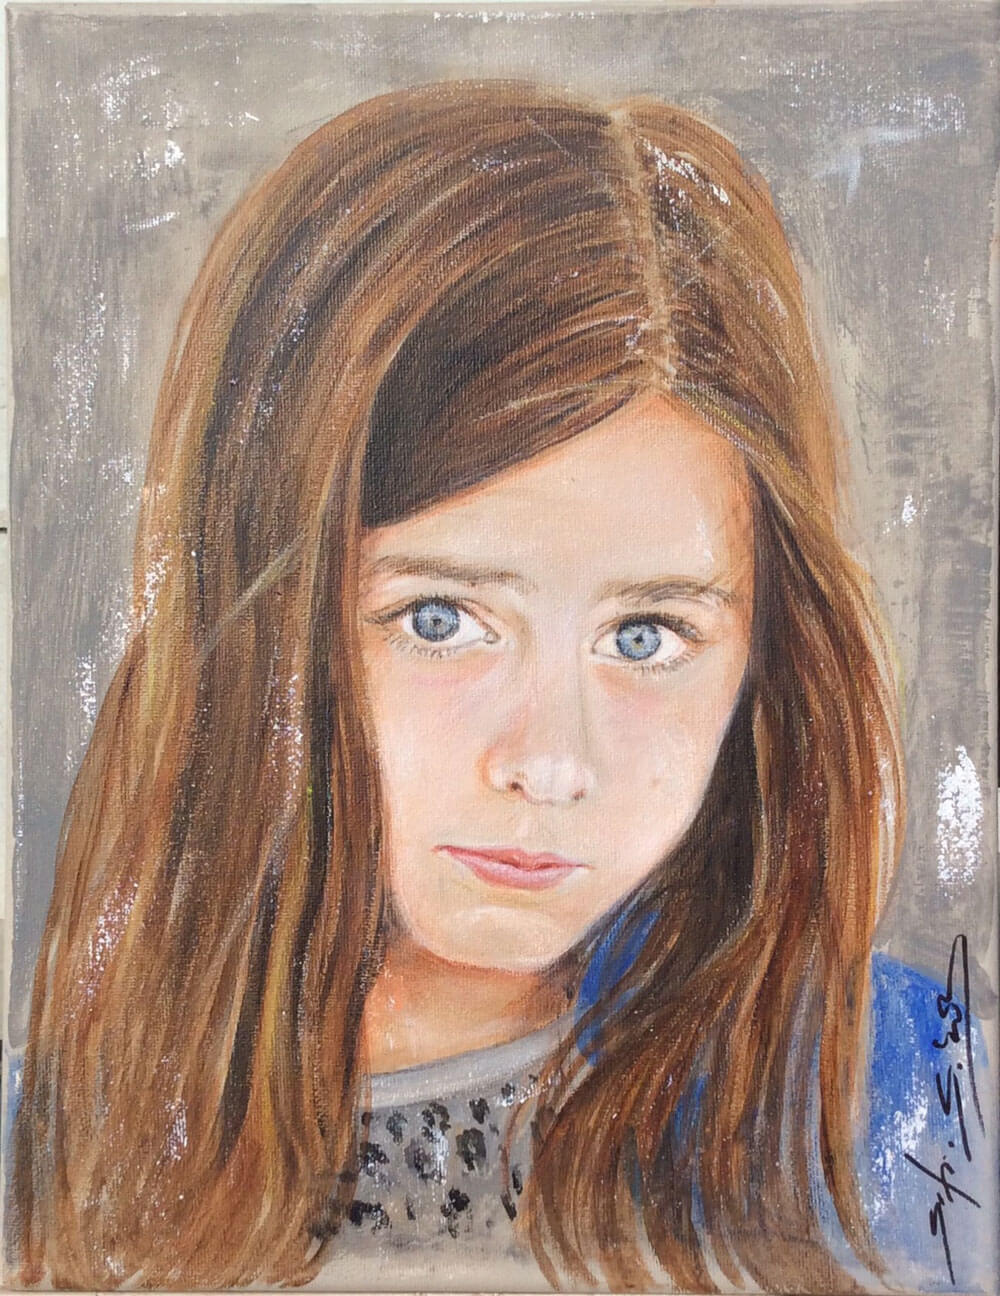 RETRATO-6-fia-sofia-simoes-pintora-pintura-painting